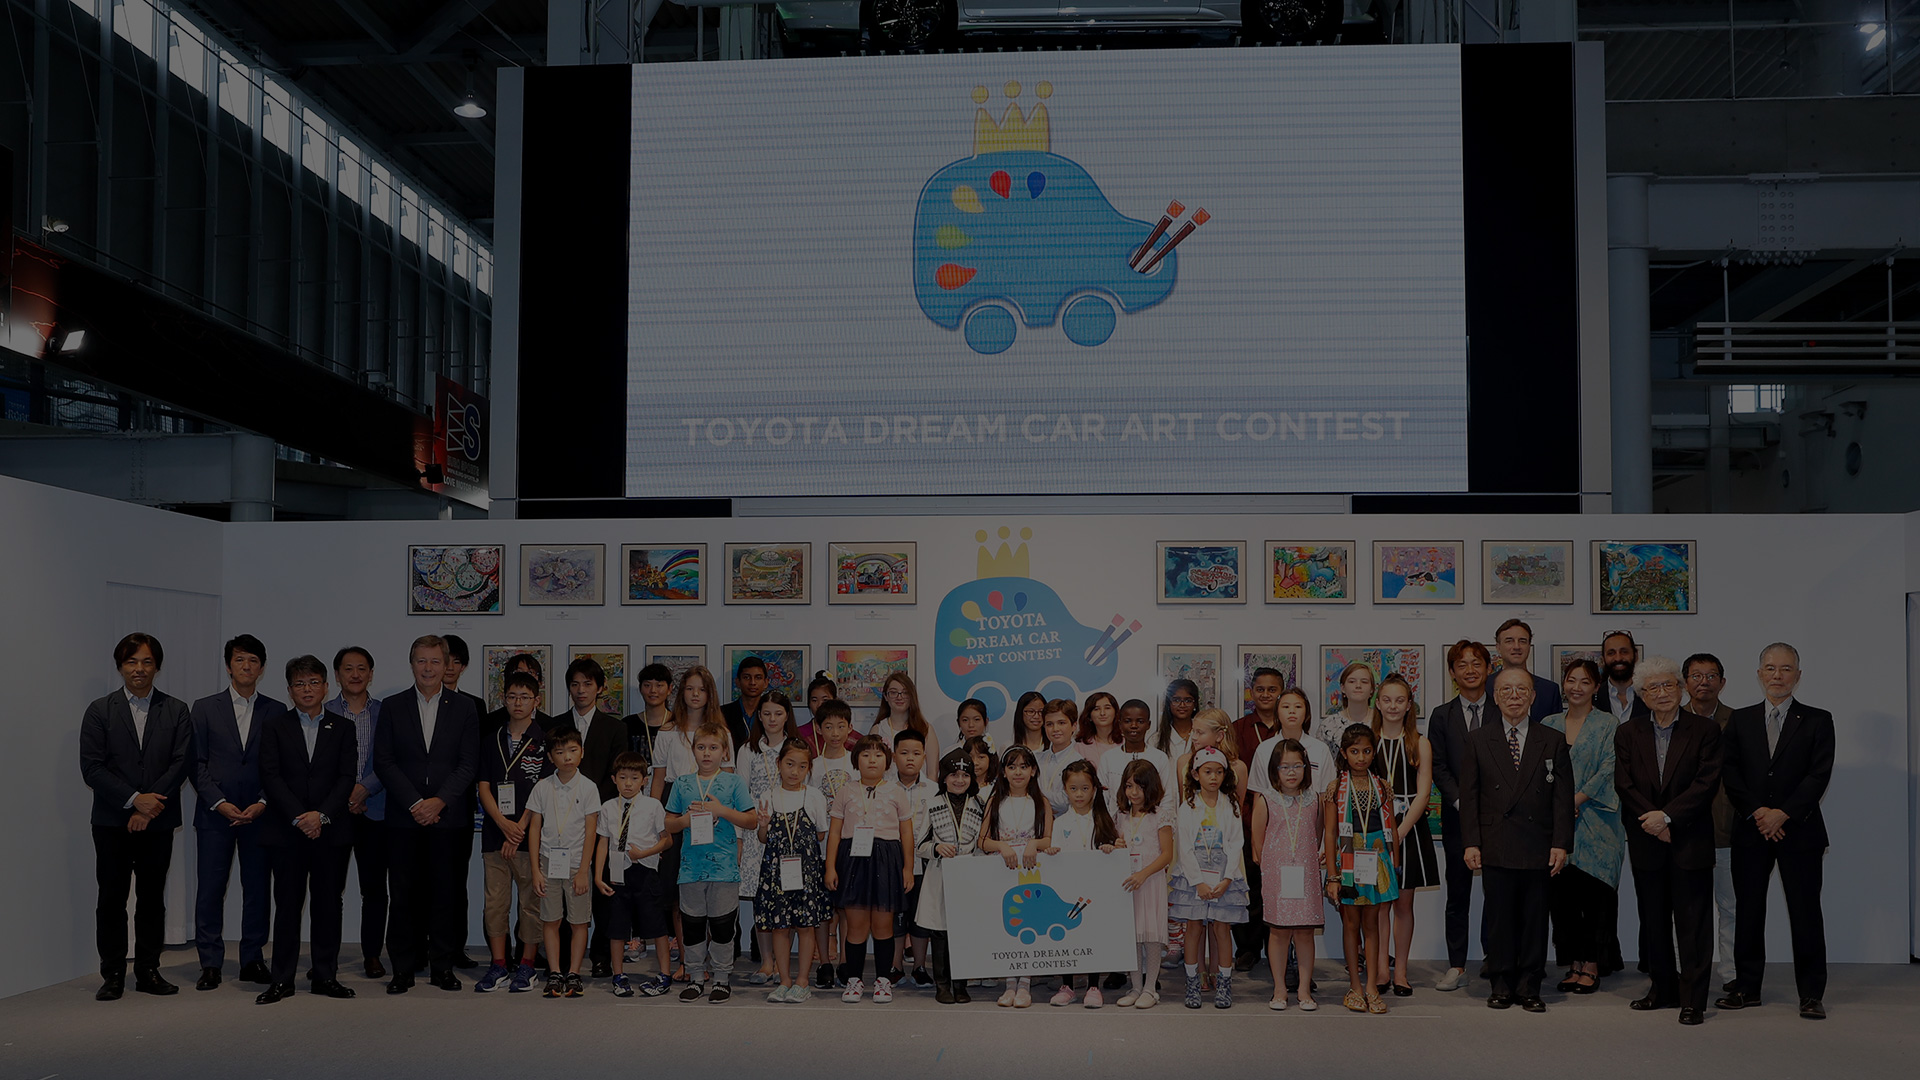 toyota global site toyota dream car art contest